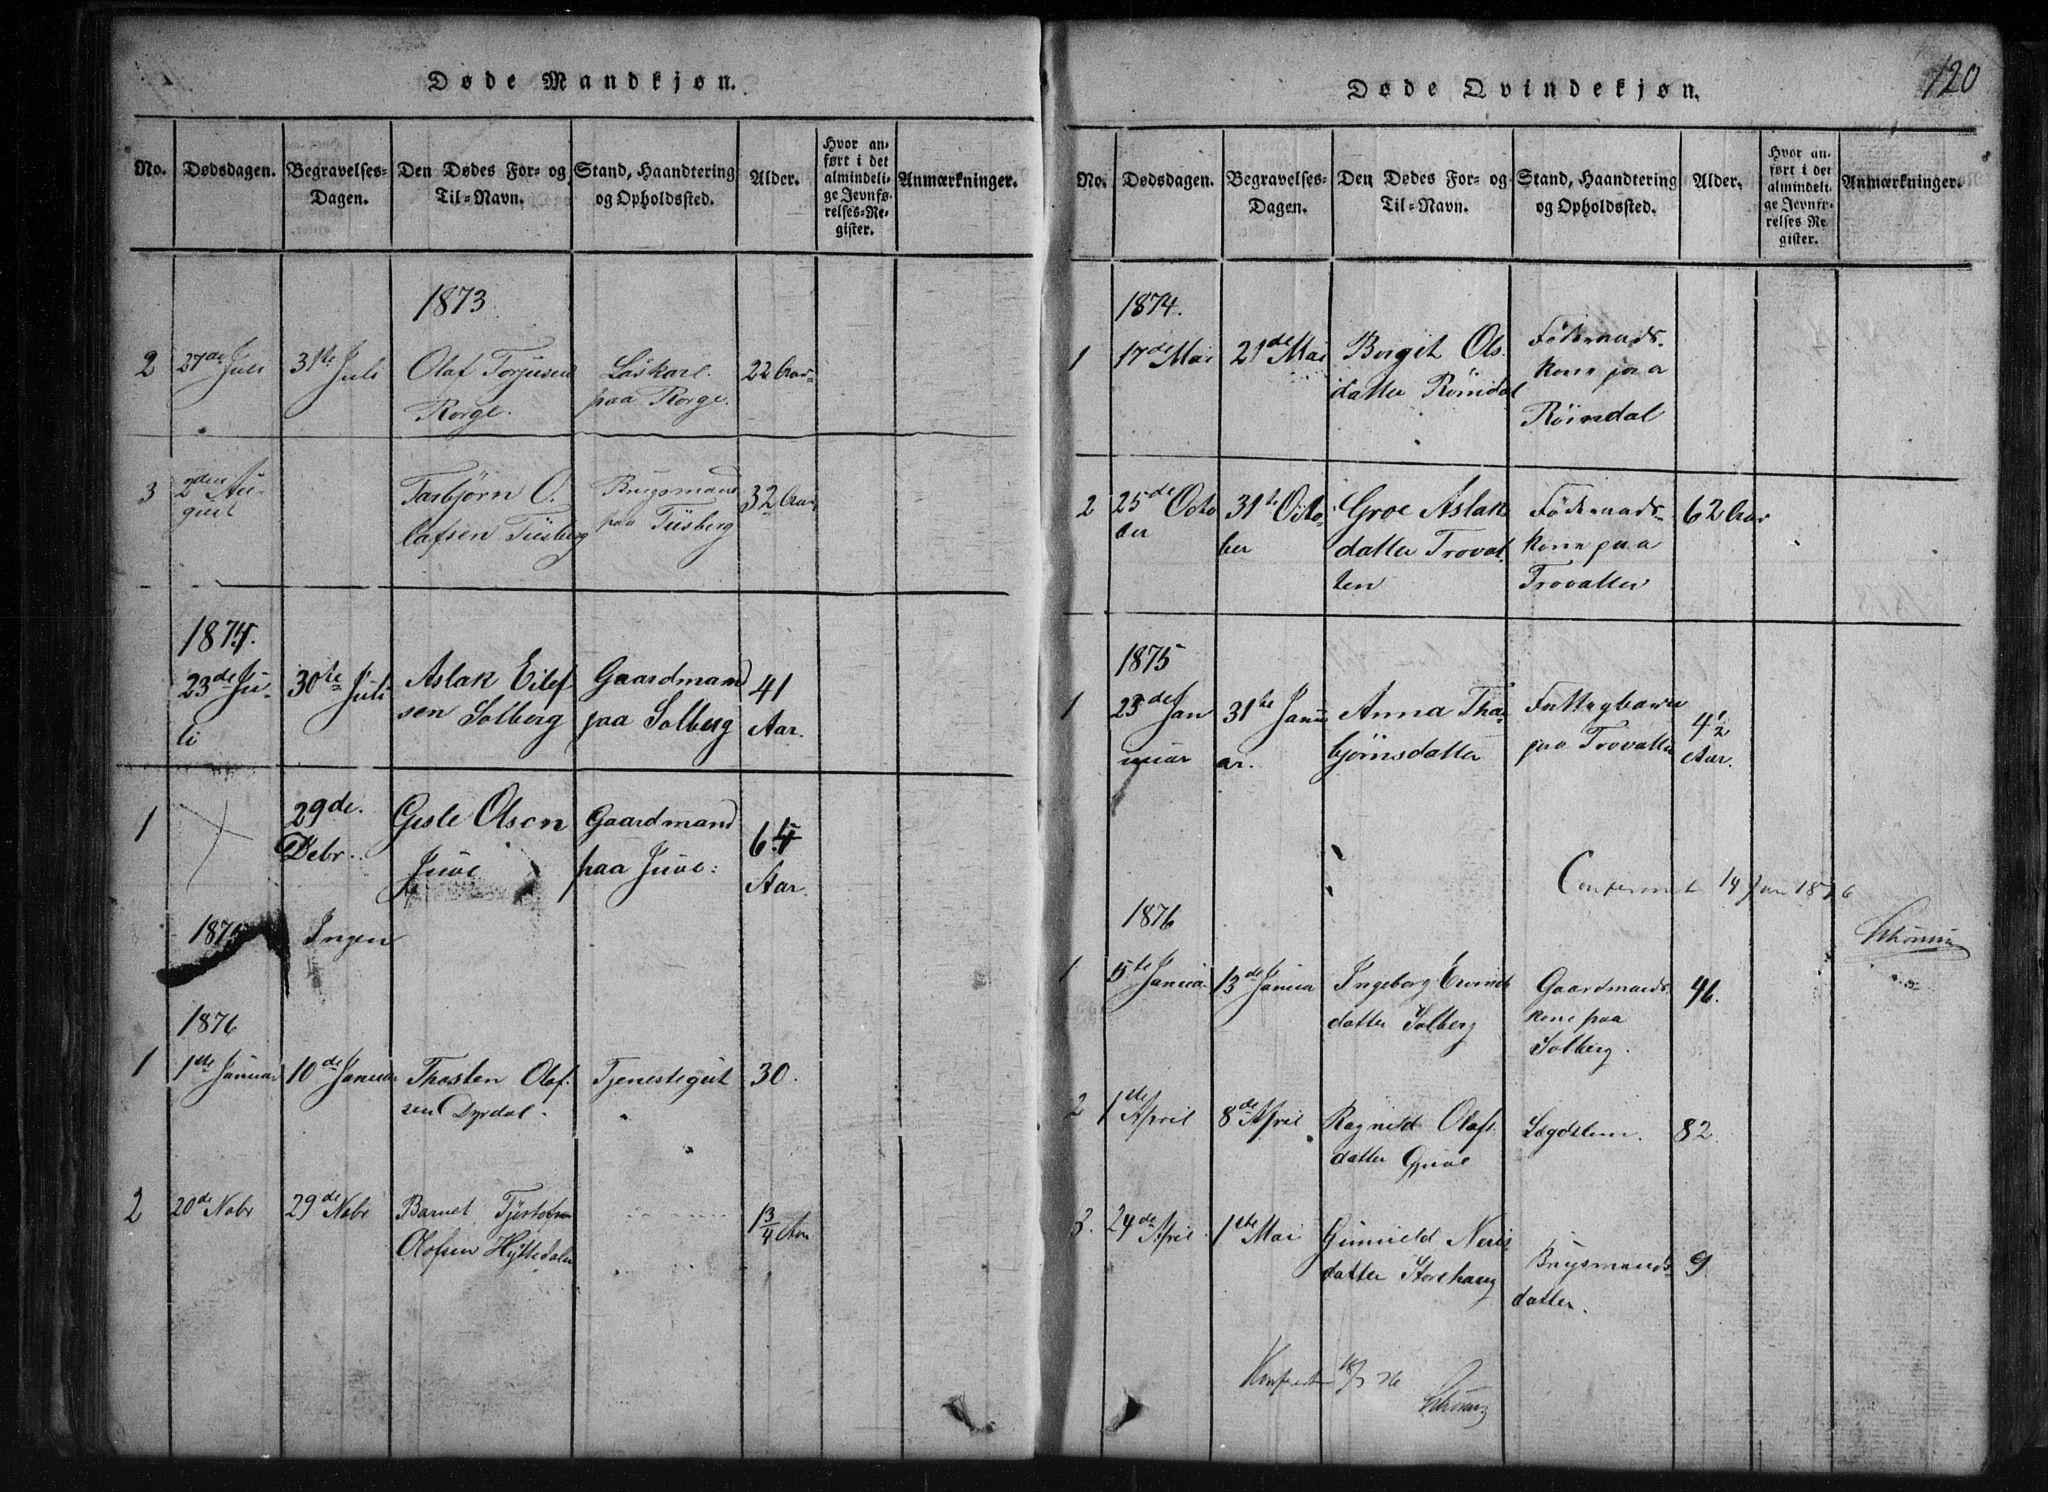 SAKO, Rauland kirkebøker, G/Gb/L0001: Parish register (copy) no. II 1, 1815-1886, p. 120